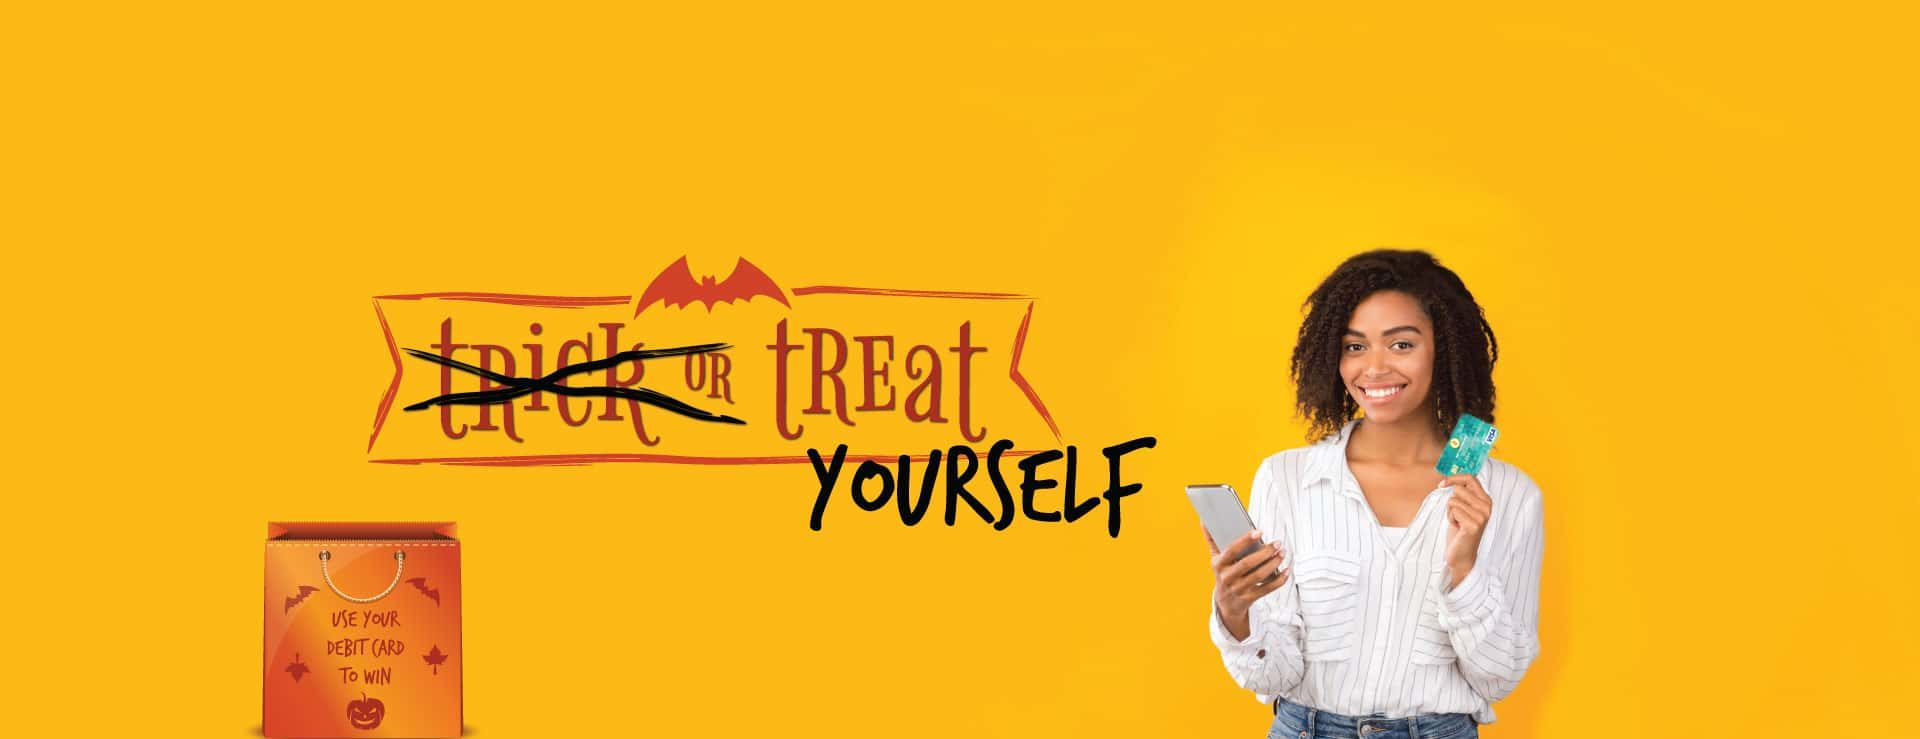 treat-yourself-web-6-min